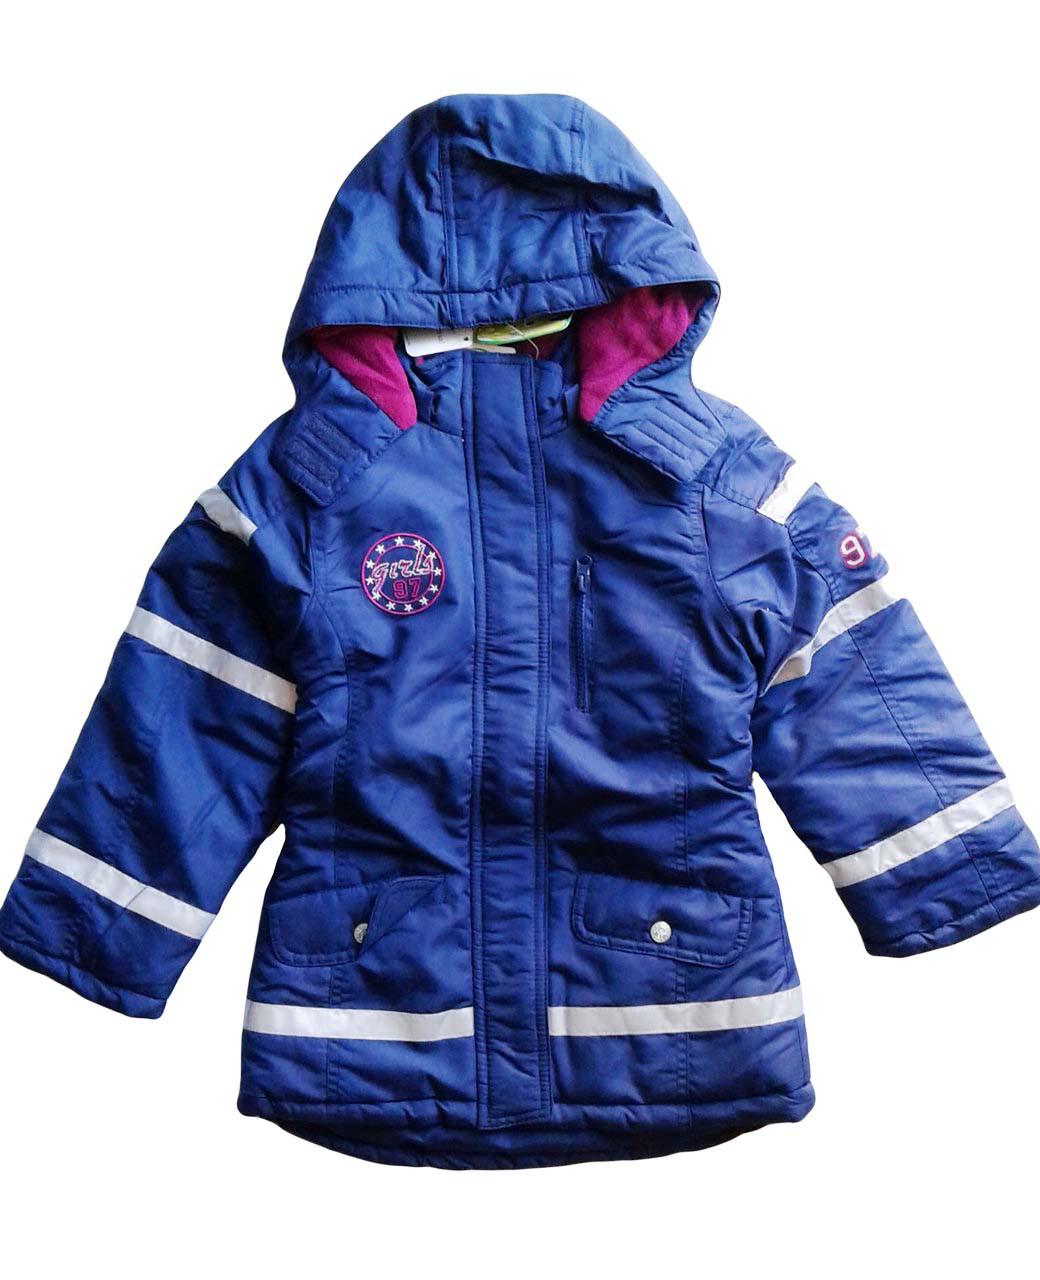 Куртка на флисе для девочки, Pepperts, размеры 122,128,134,140,146 , арт. Л-419